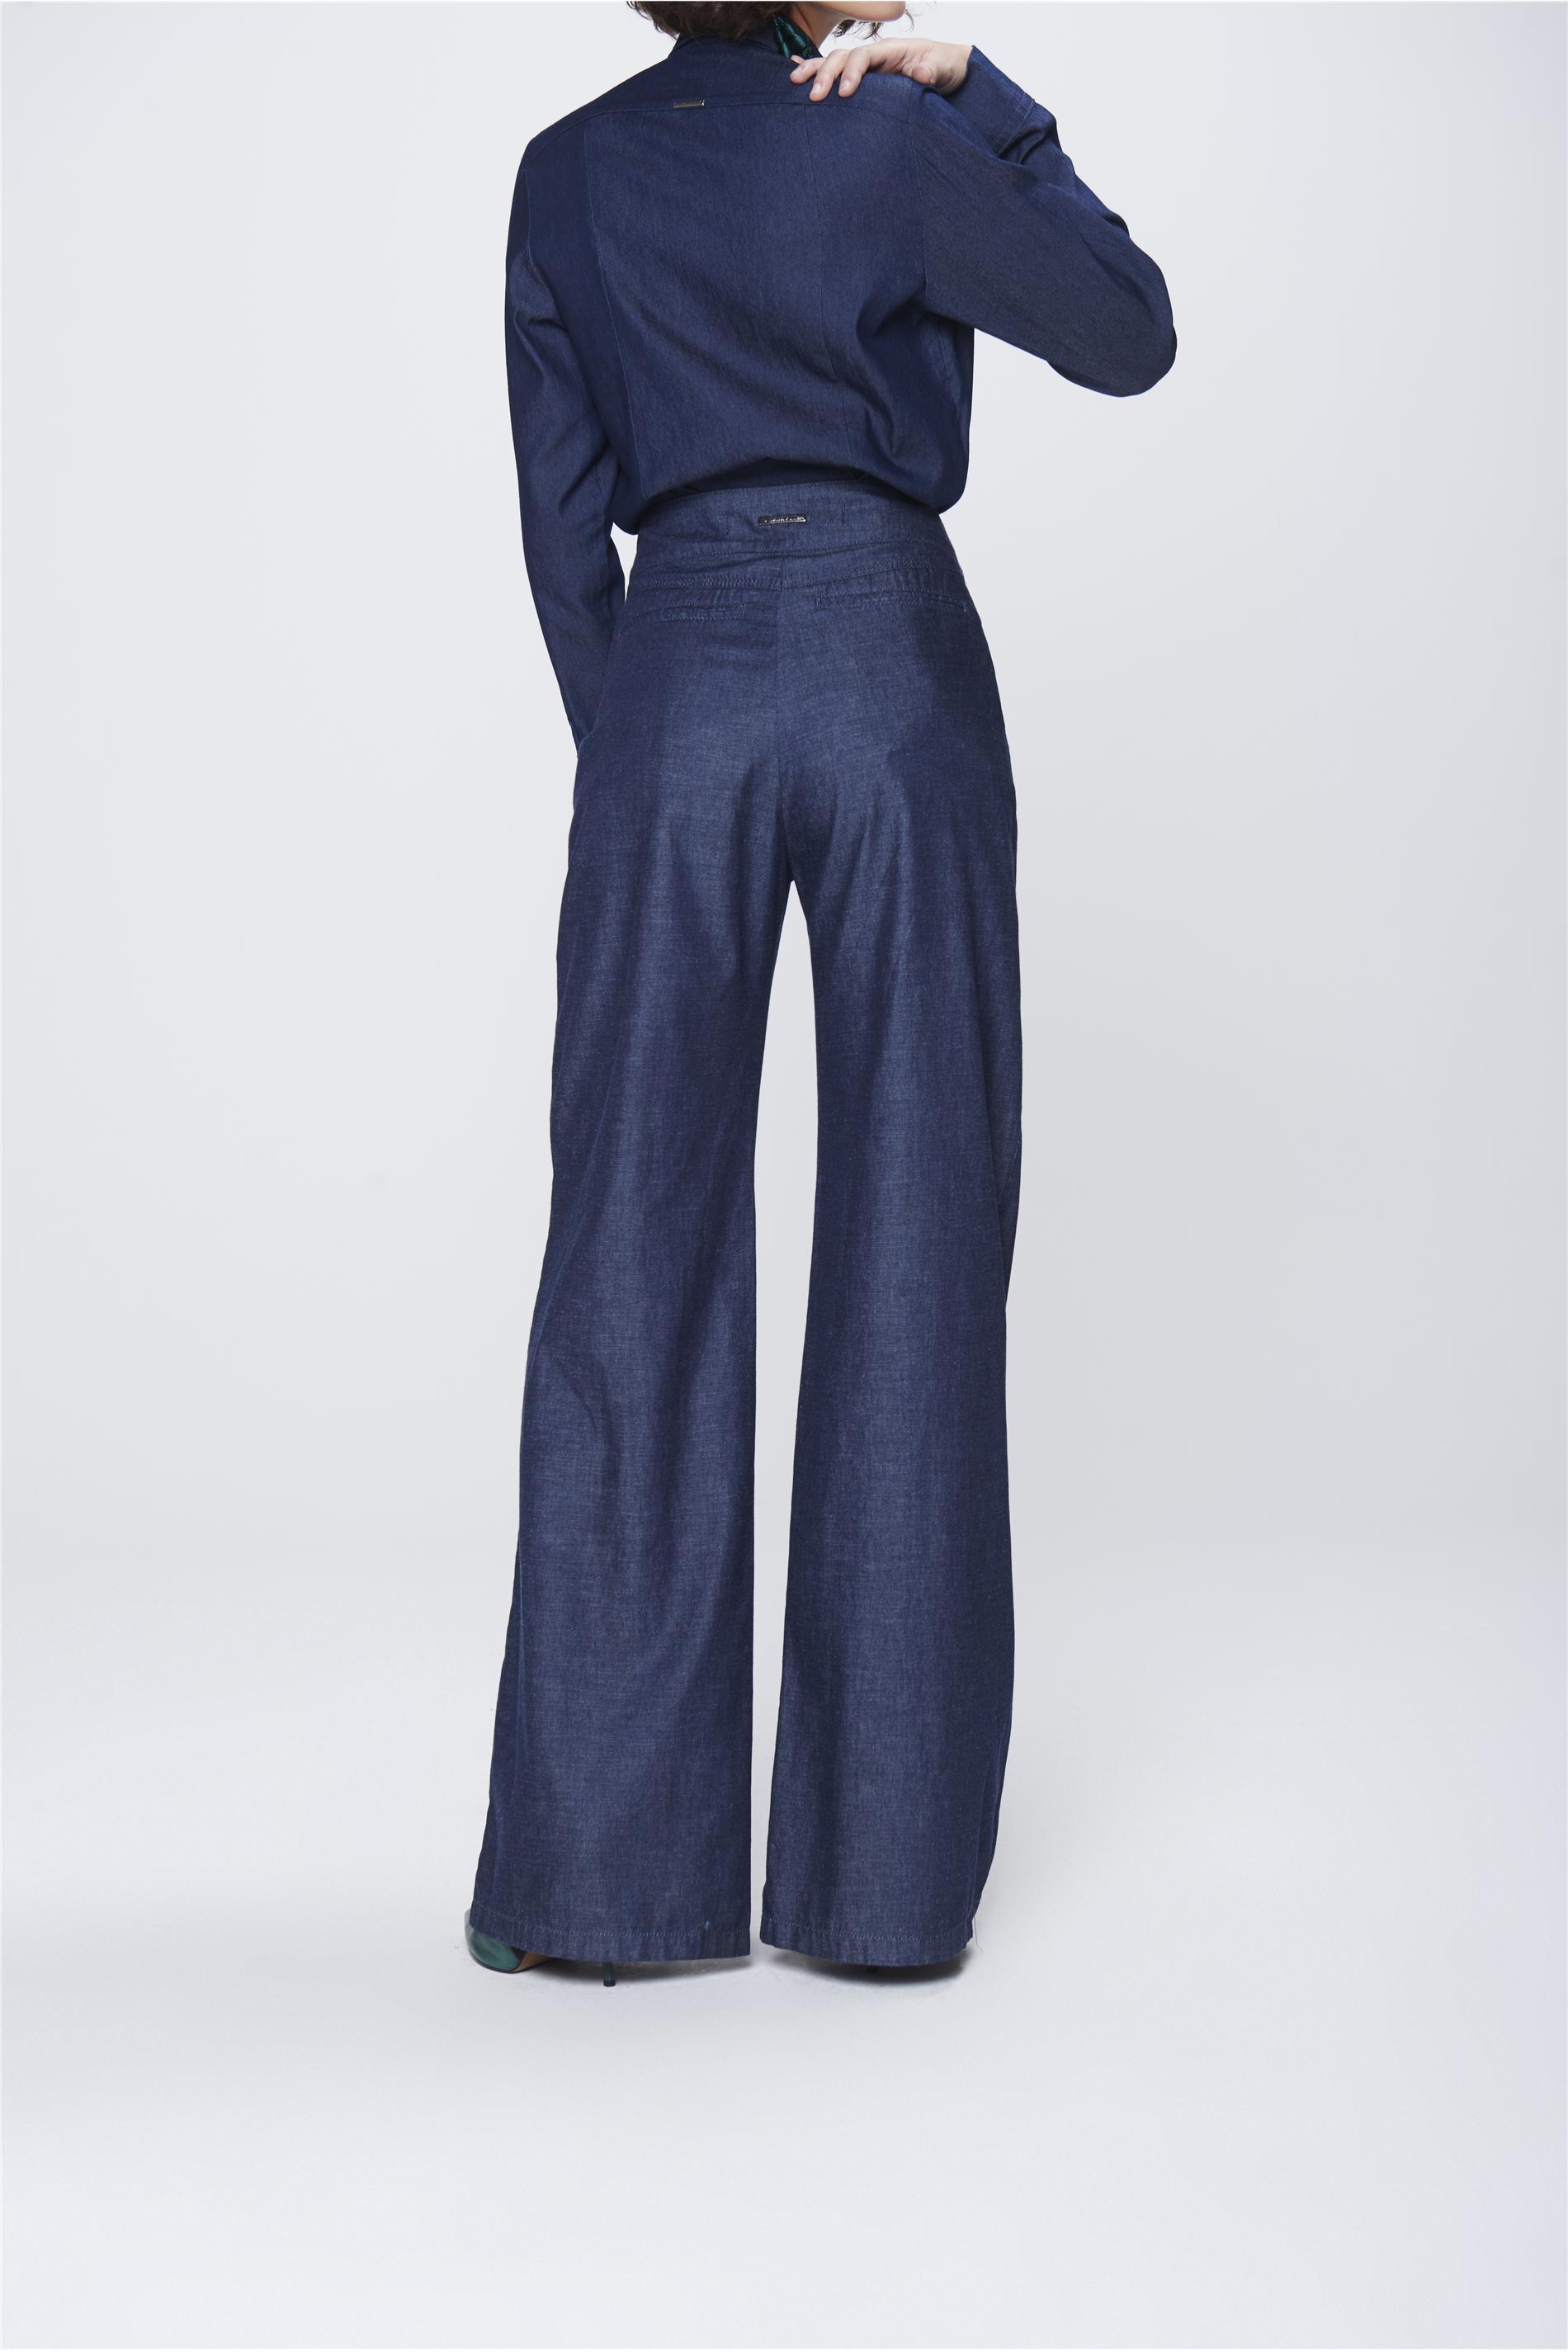 ea4047d77 Calça Pantalona Jeans com Cinto Feminina - Damyller